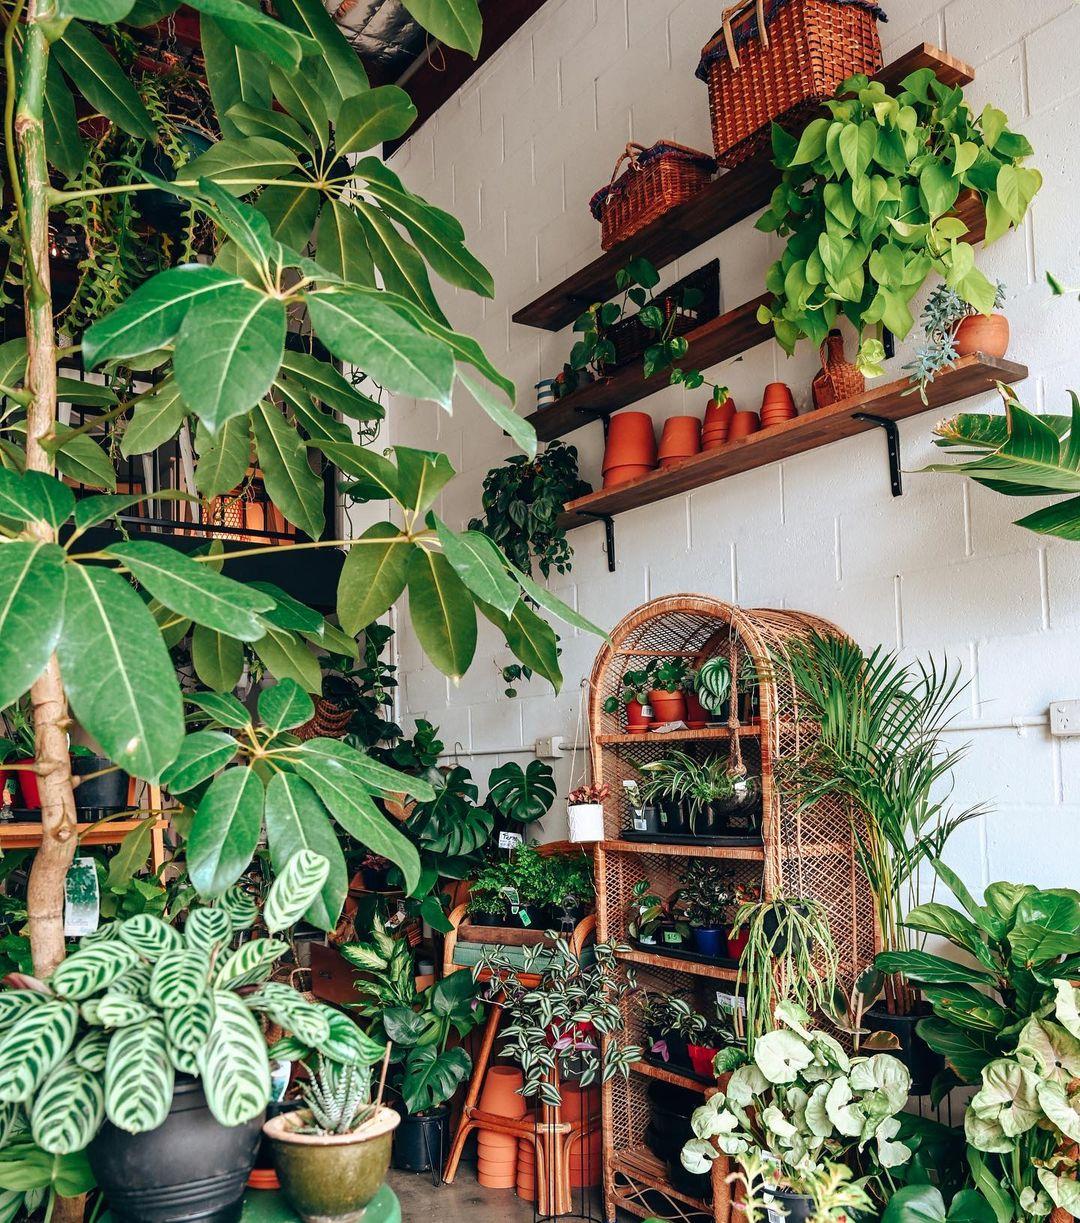 a shop full of plants